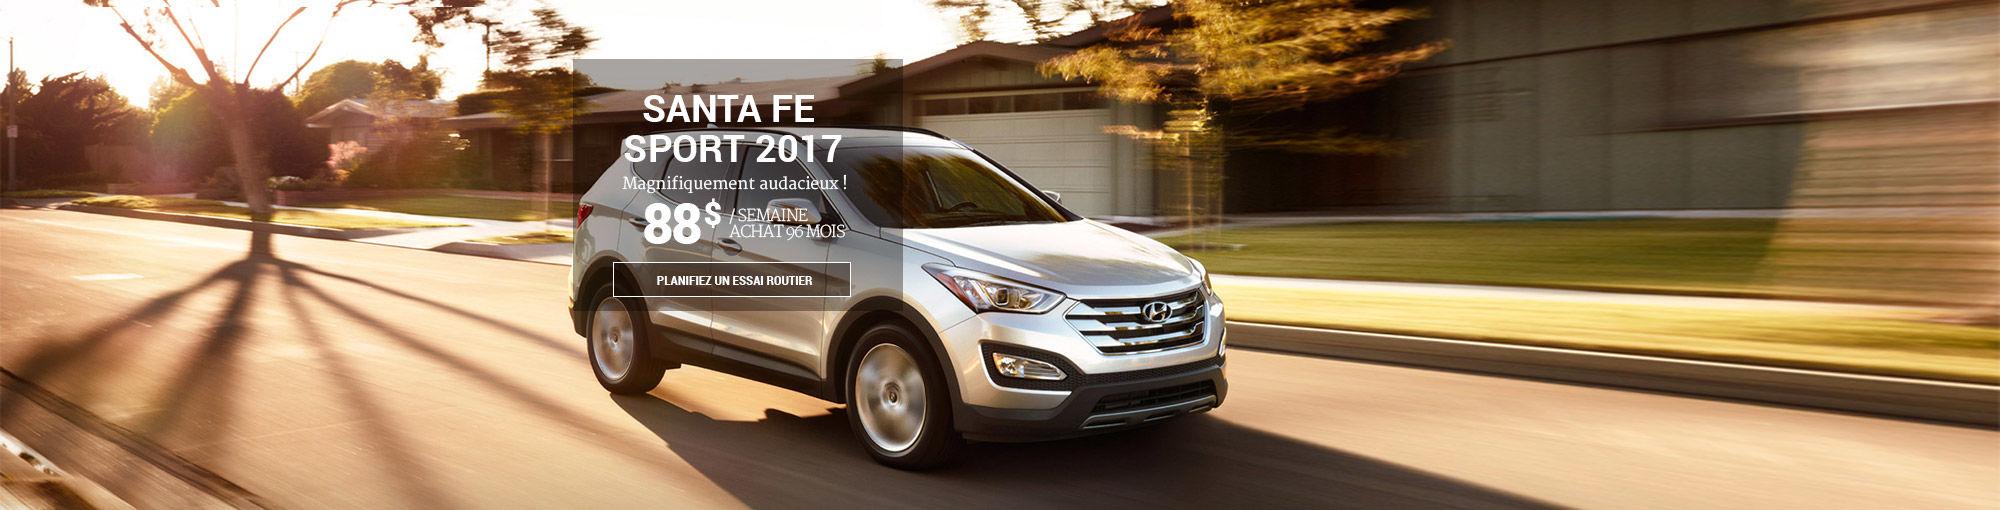 Hyundai Santa Fe Sport 2016 - header - septembre 2016 htr et hsh